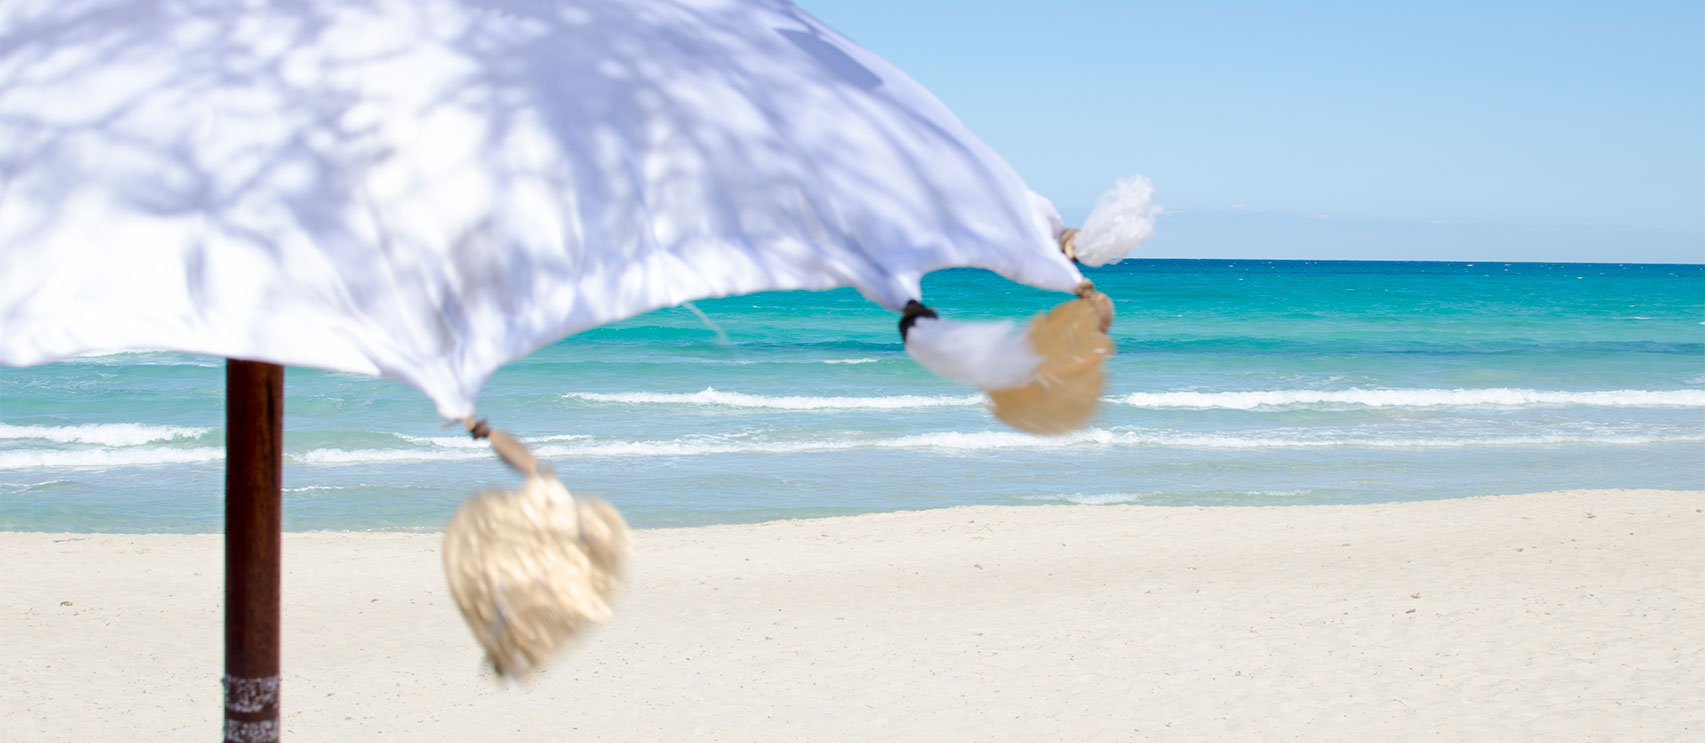 umbrella-ponderosa-beach